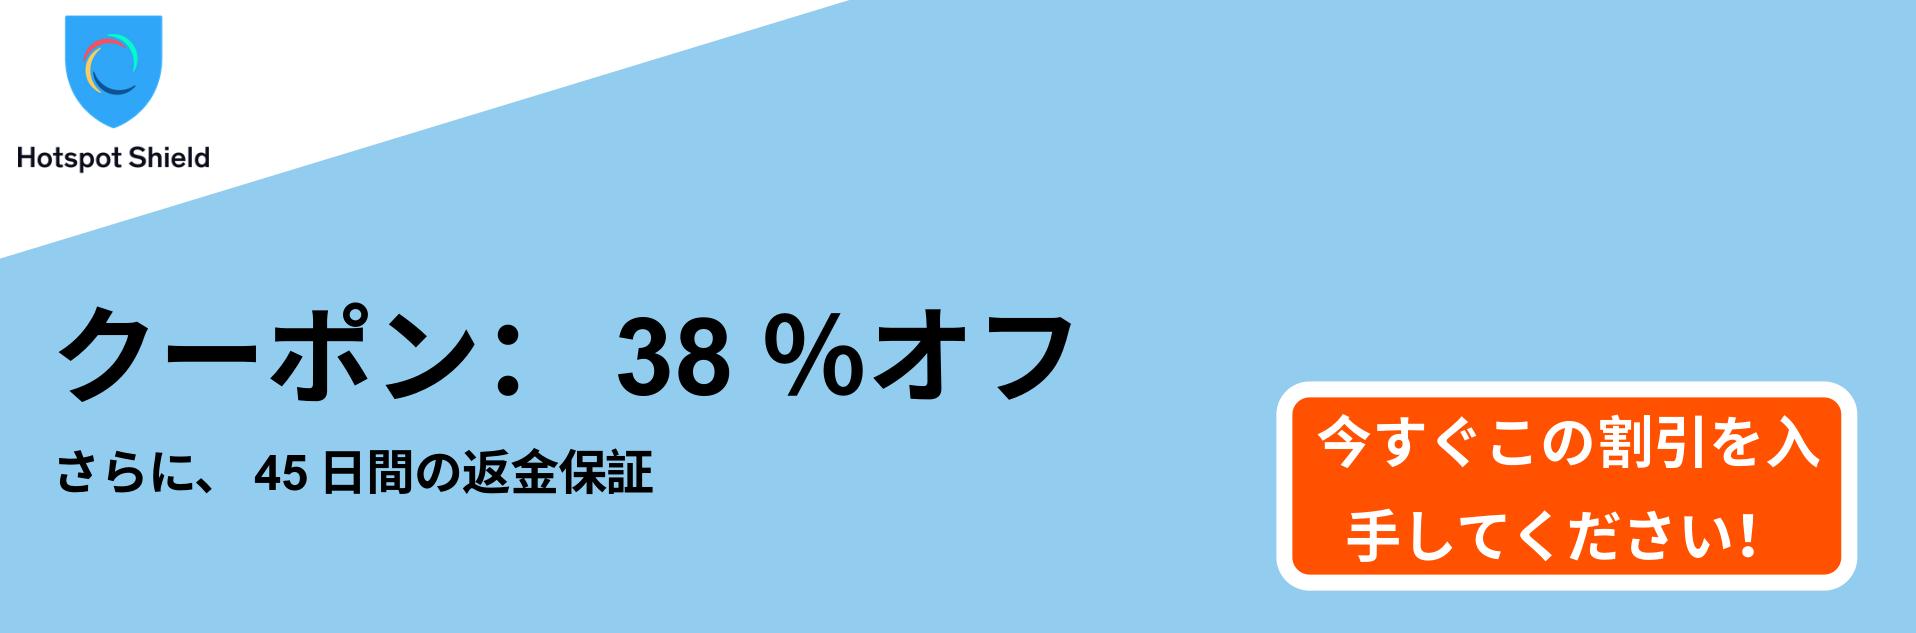 HotspotShield VPNクーポンバナー-38%オフ